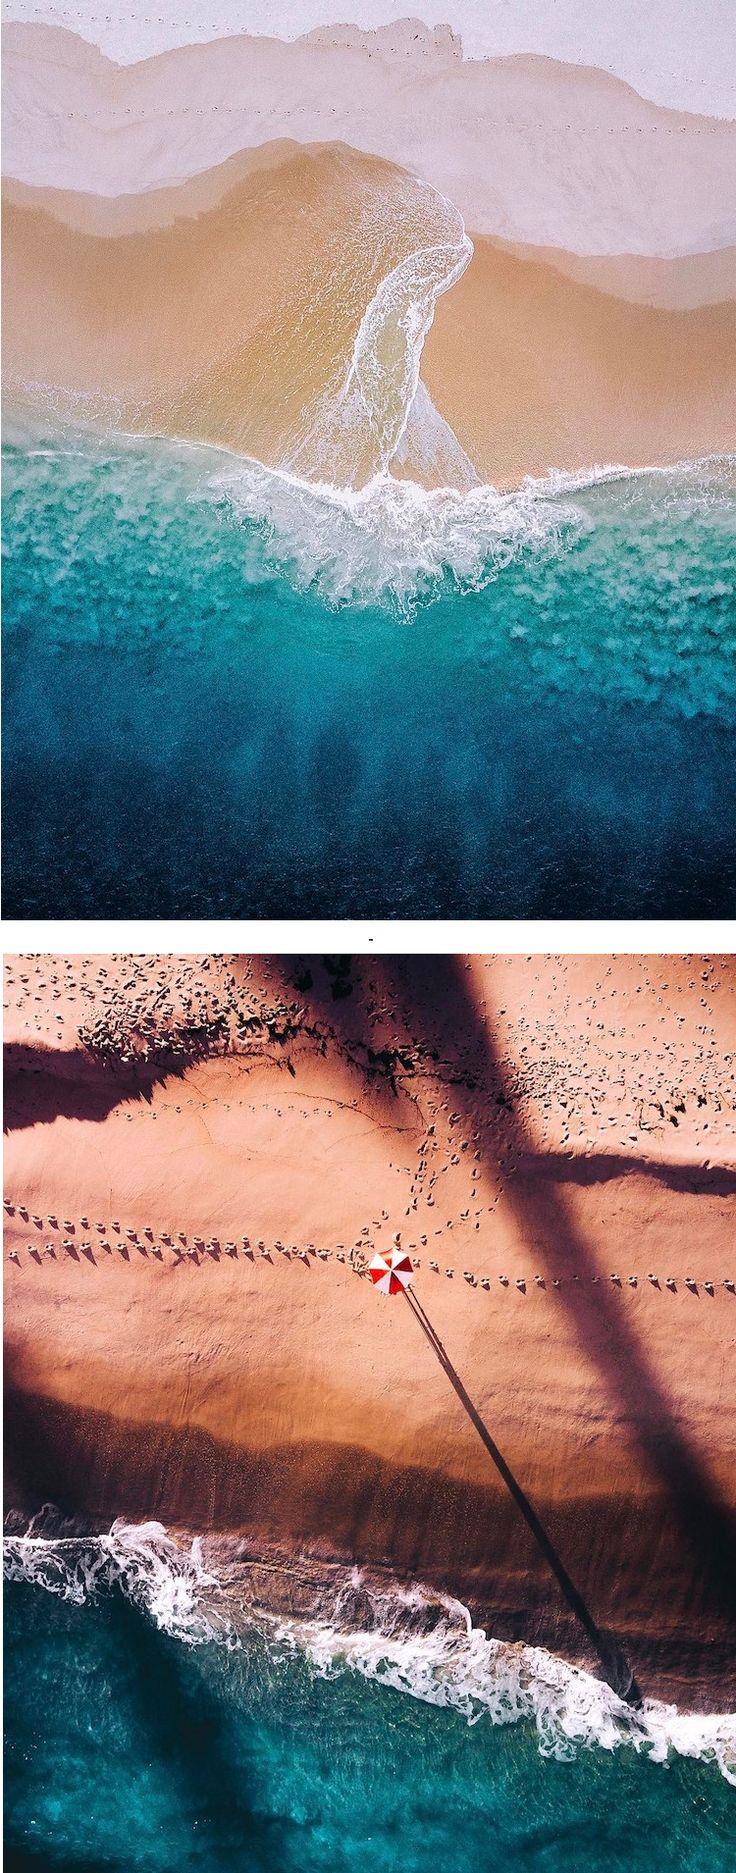 PhotographerBo Le captures stunningphotos of South Australia.